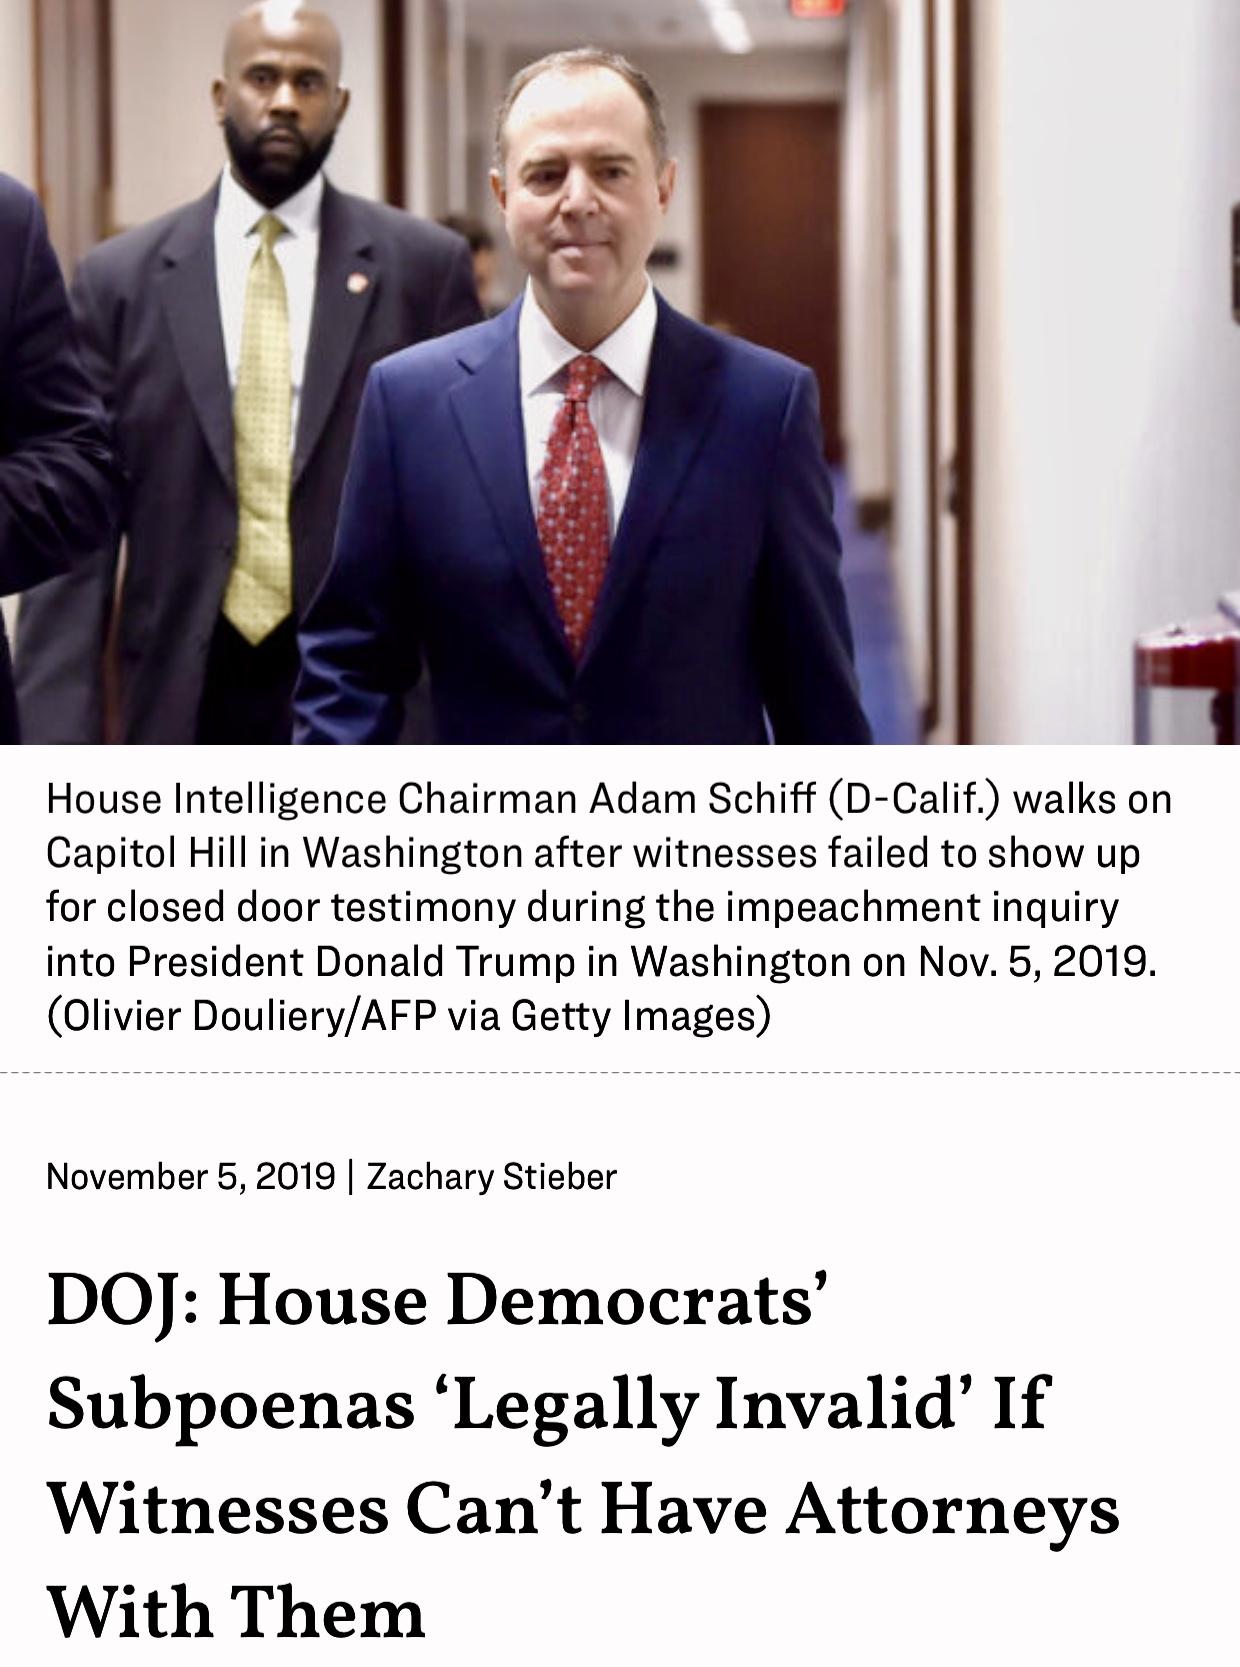 DOJ: House Democrats Subpoenas Legally Invalid